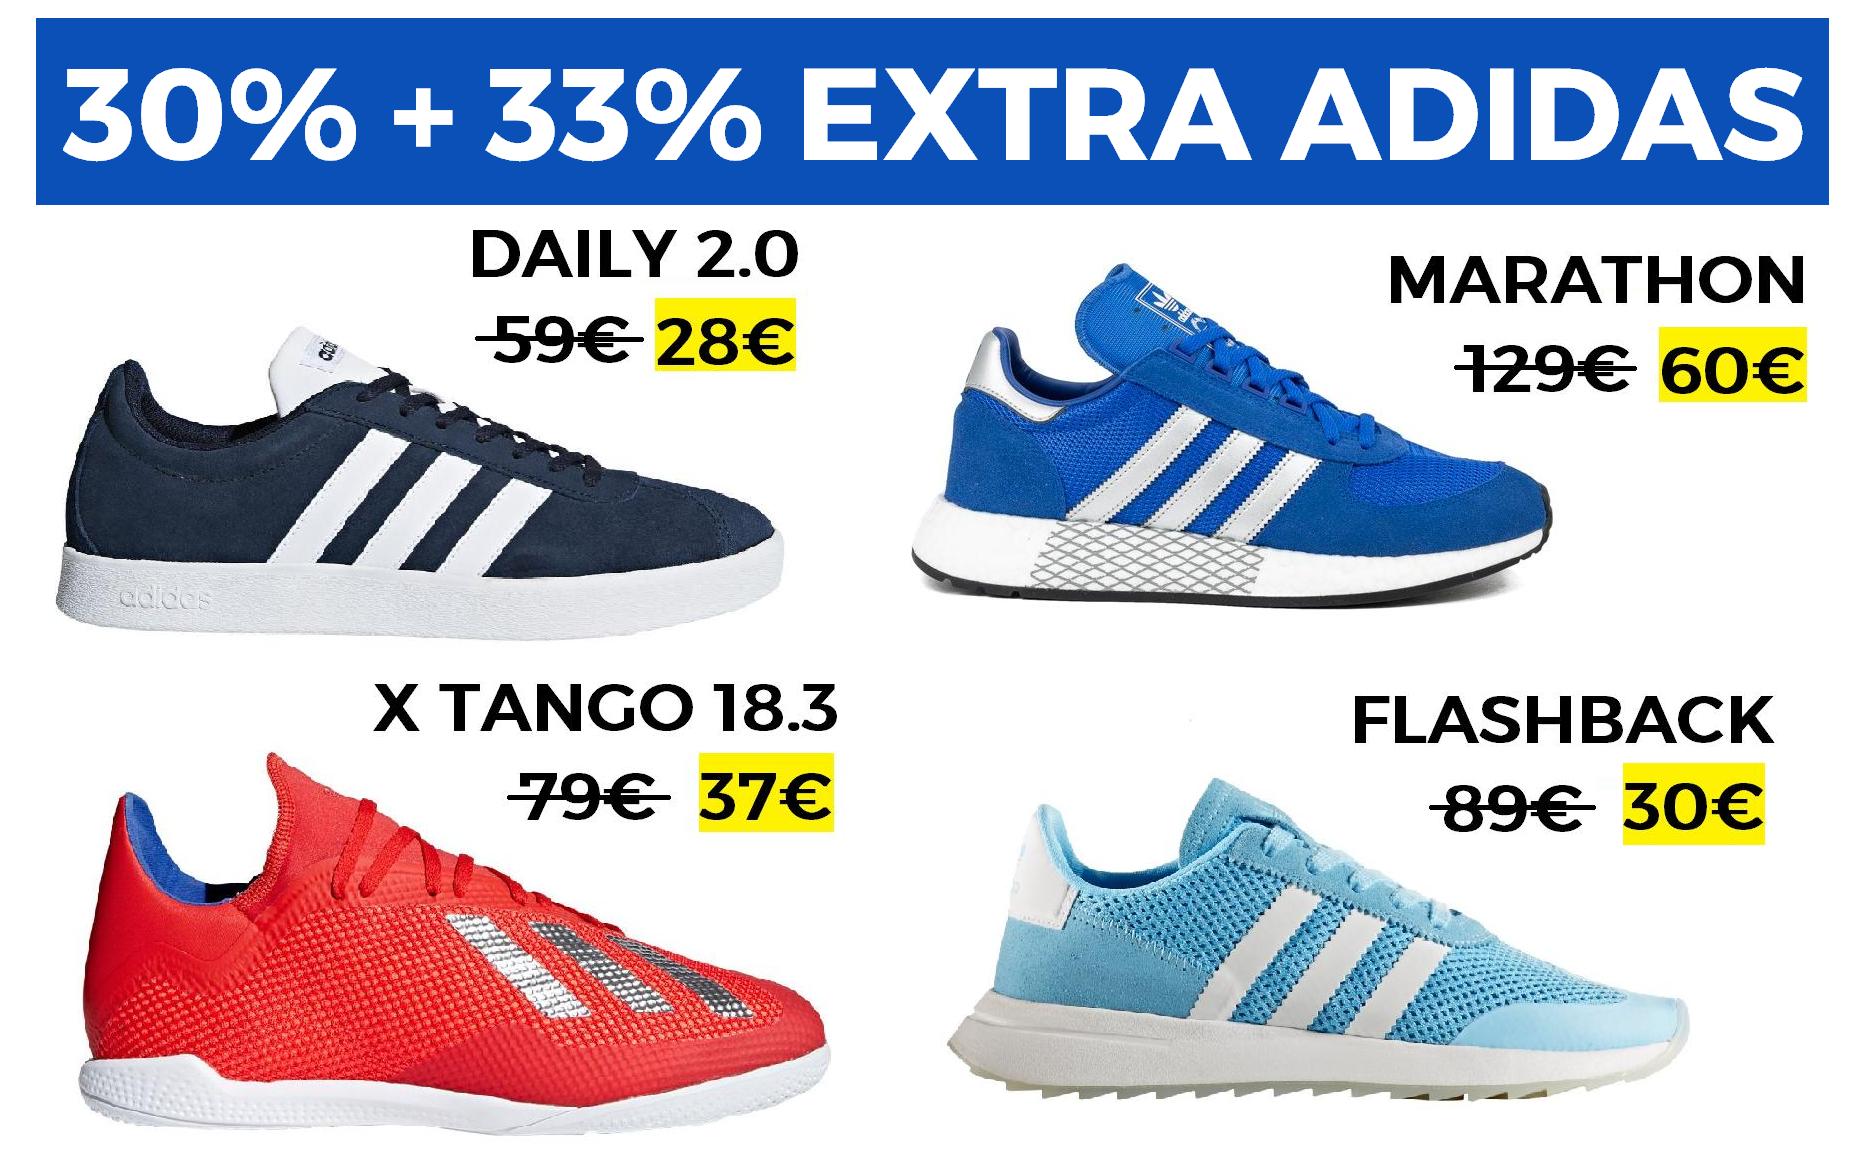 30% + 33% EXTRA en Adidas Outlet